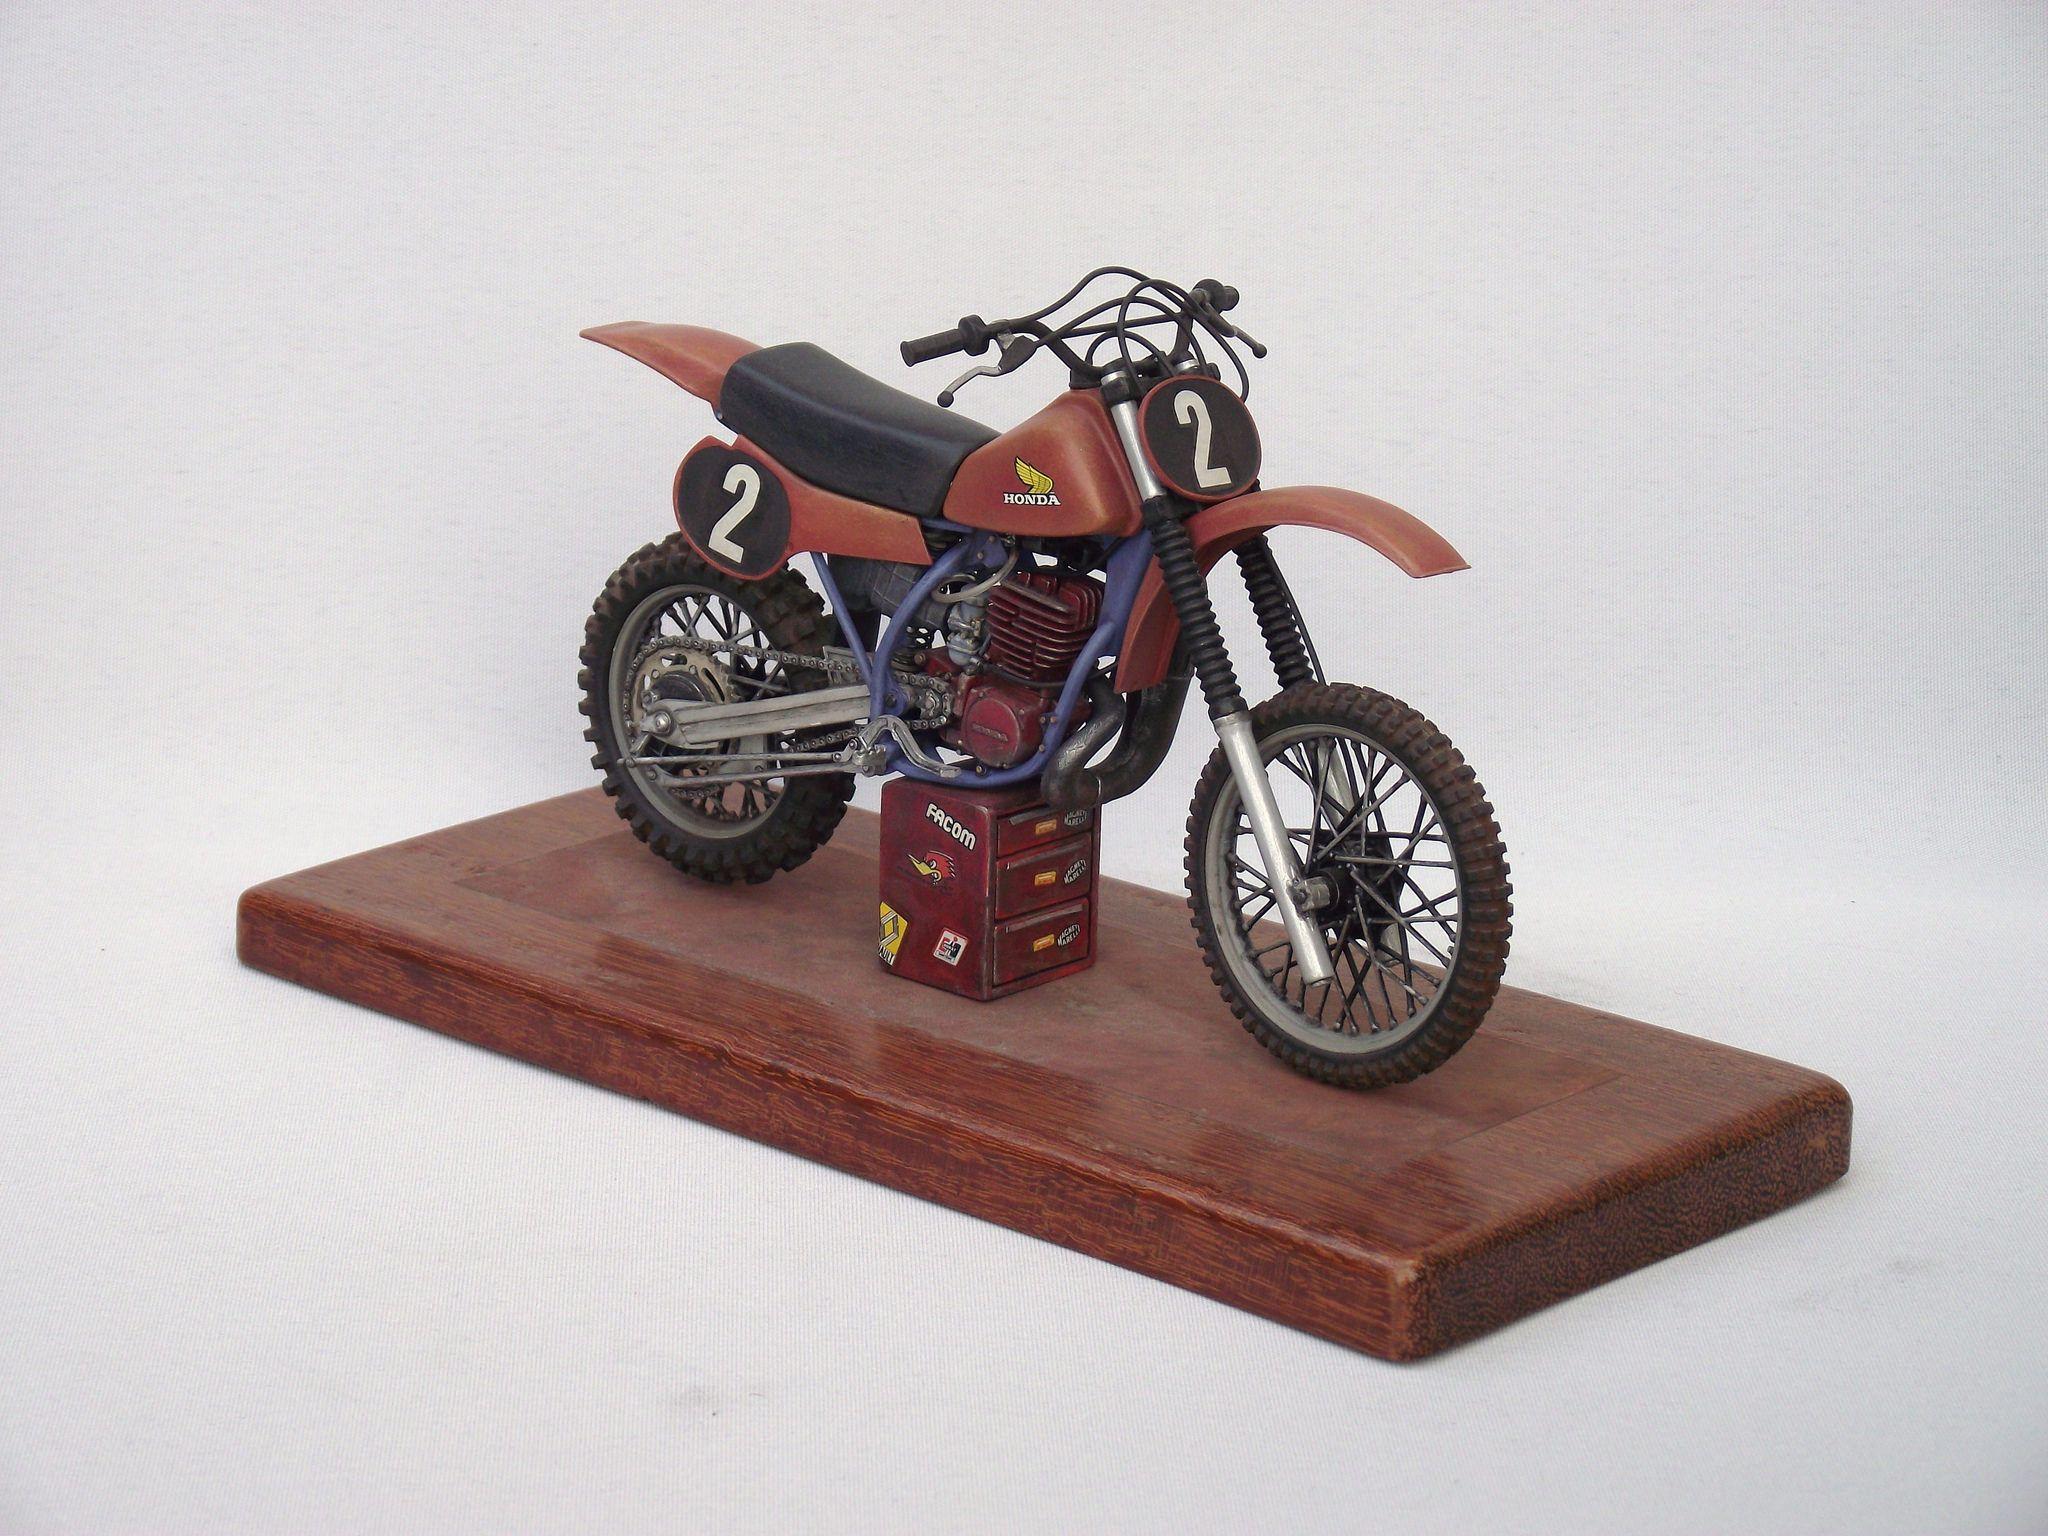 Scale Model Honda Motocrosser Motorbike 2 Scale Models Motorcycle Model Motorbikes